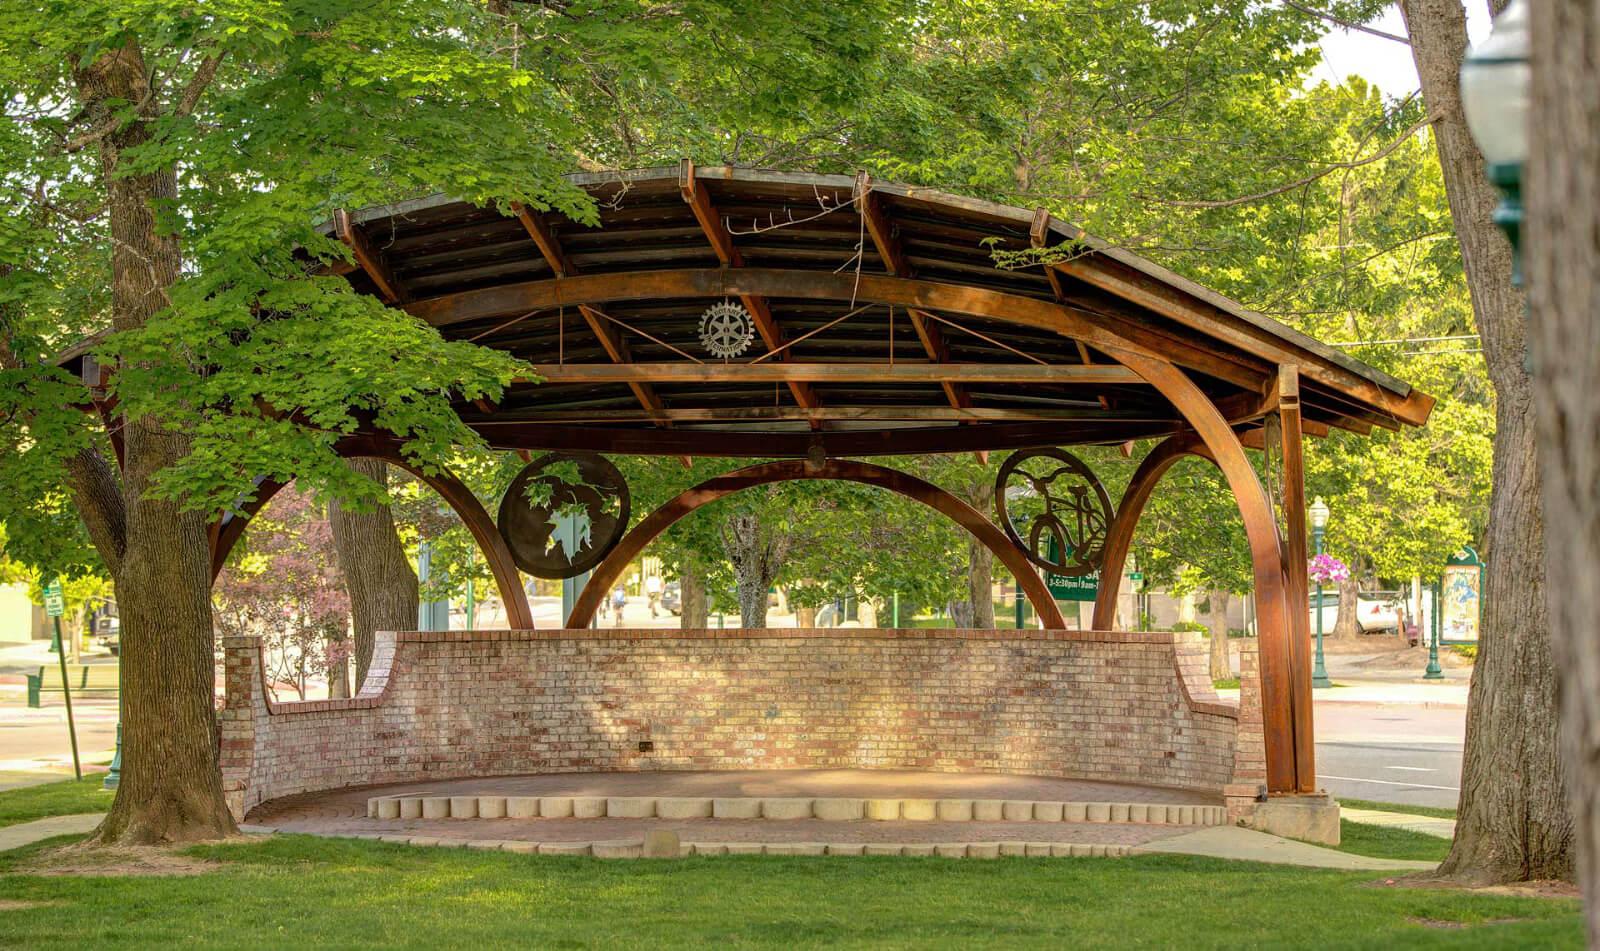 A Whimsical Steel Bandshell for Sandpoint's Farmin Park